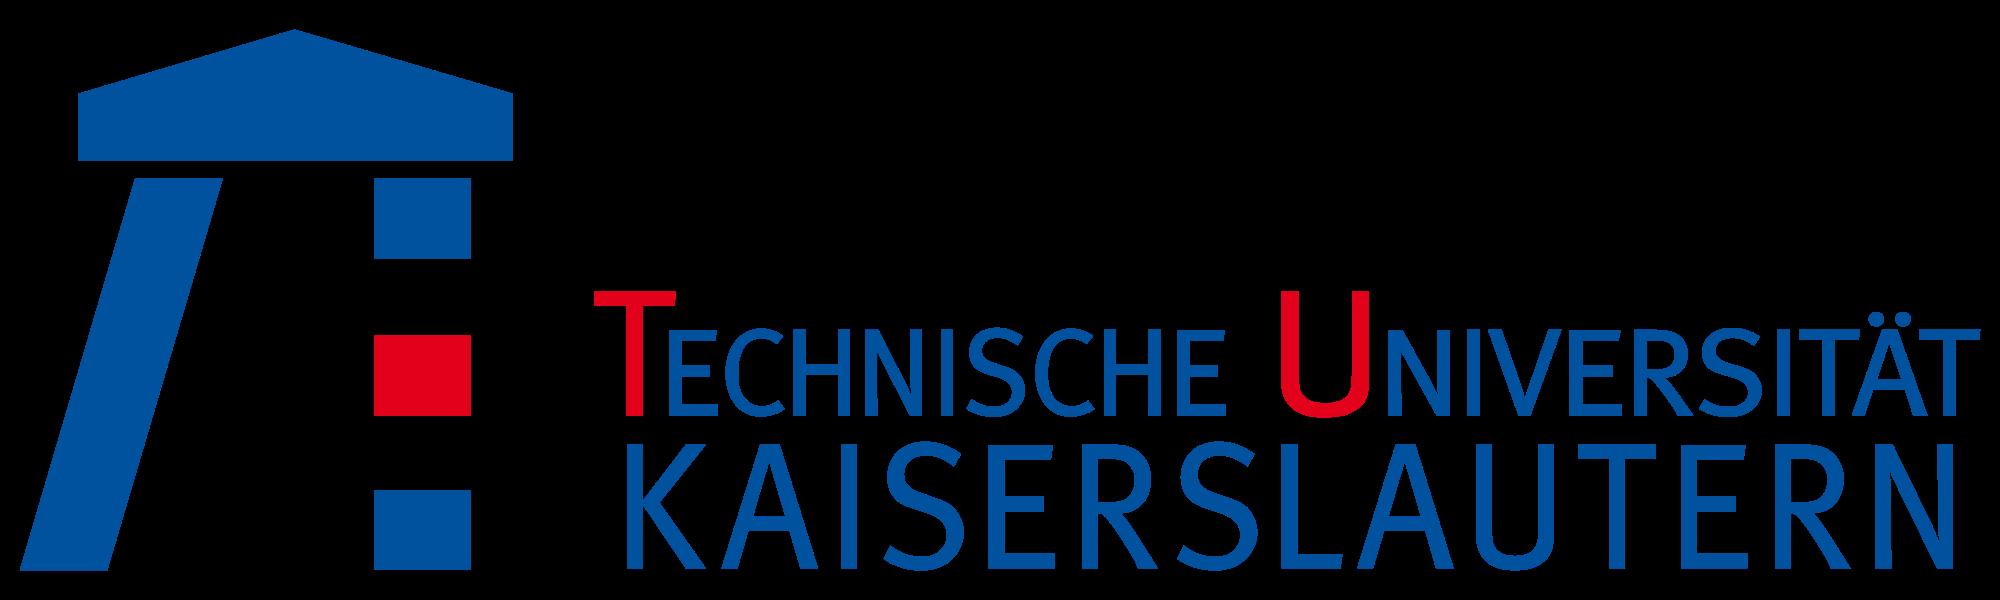 Technische Universität Kaiserslautern Allgemeine Zoologie